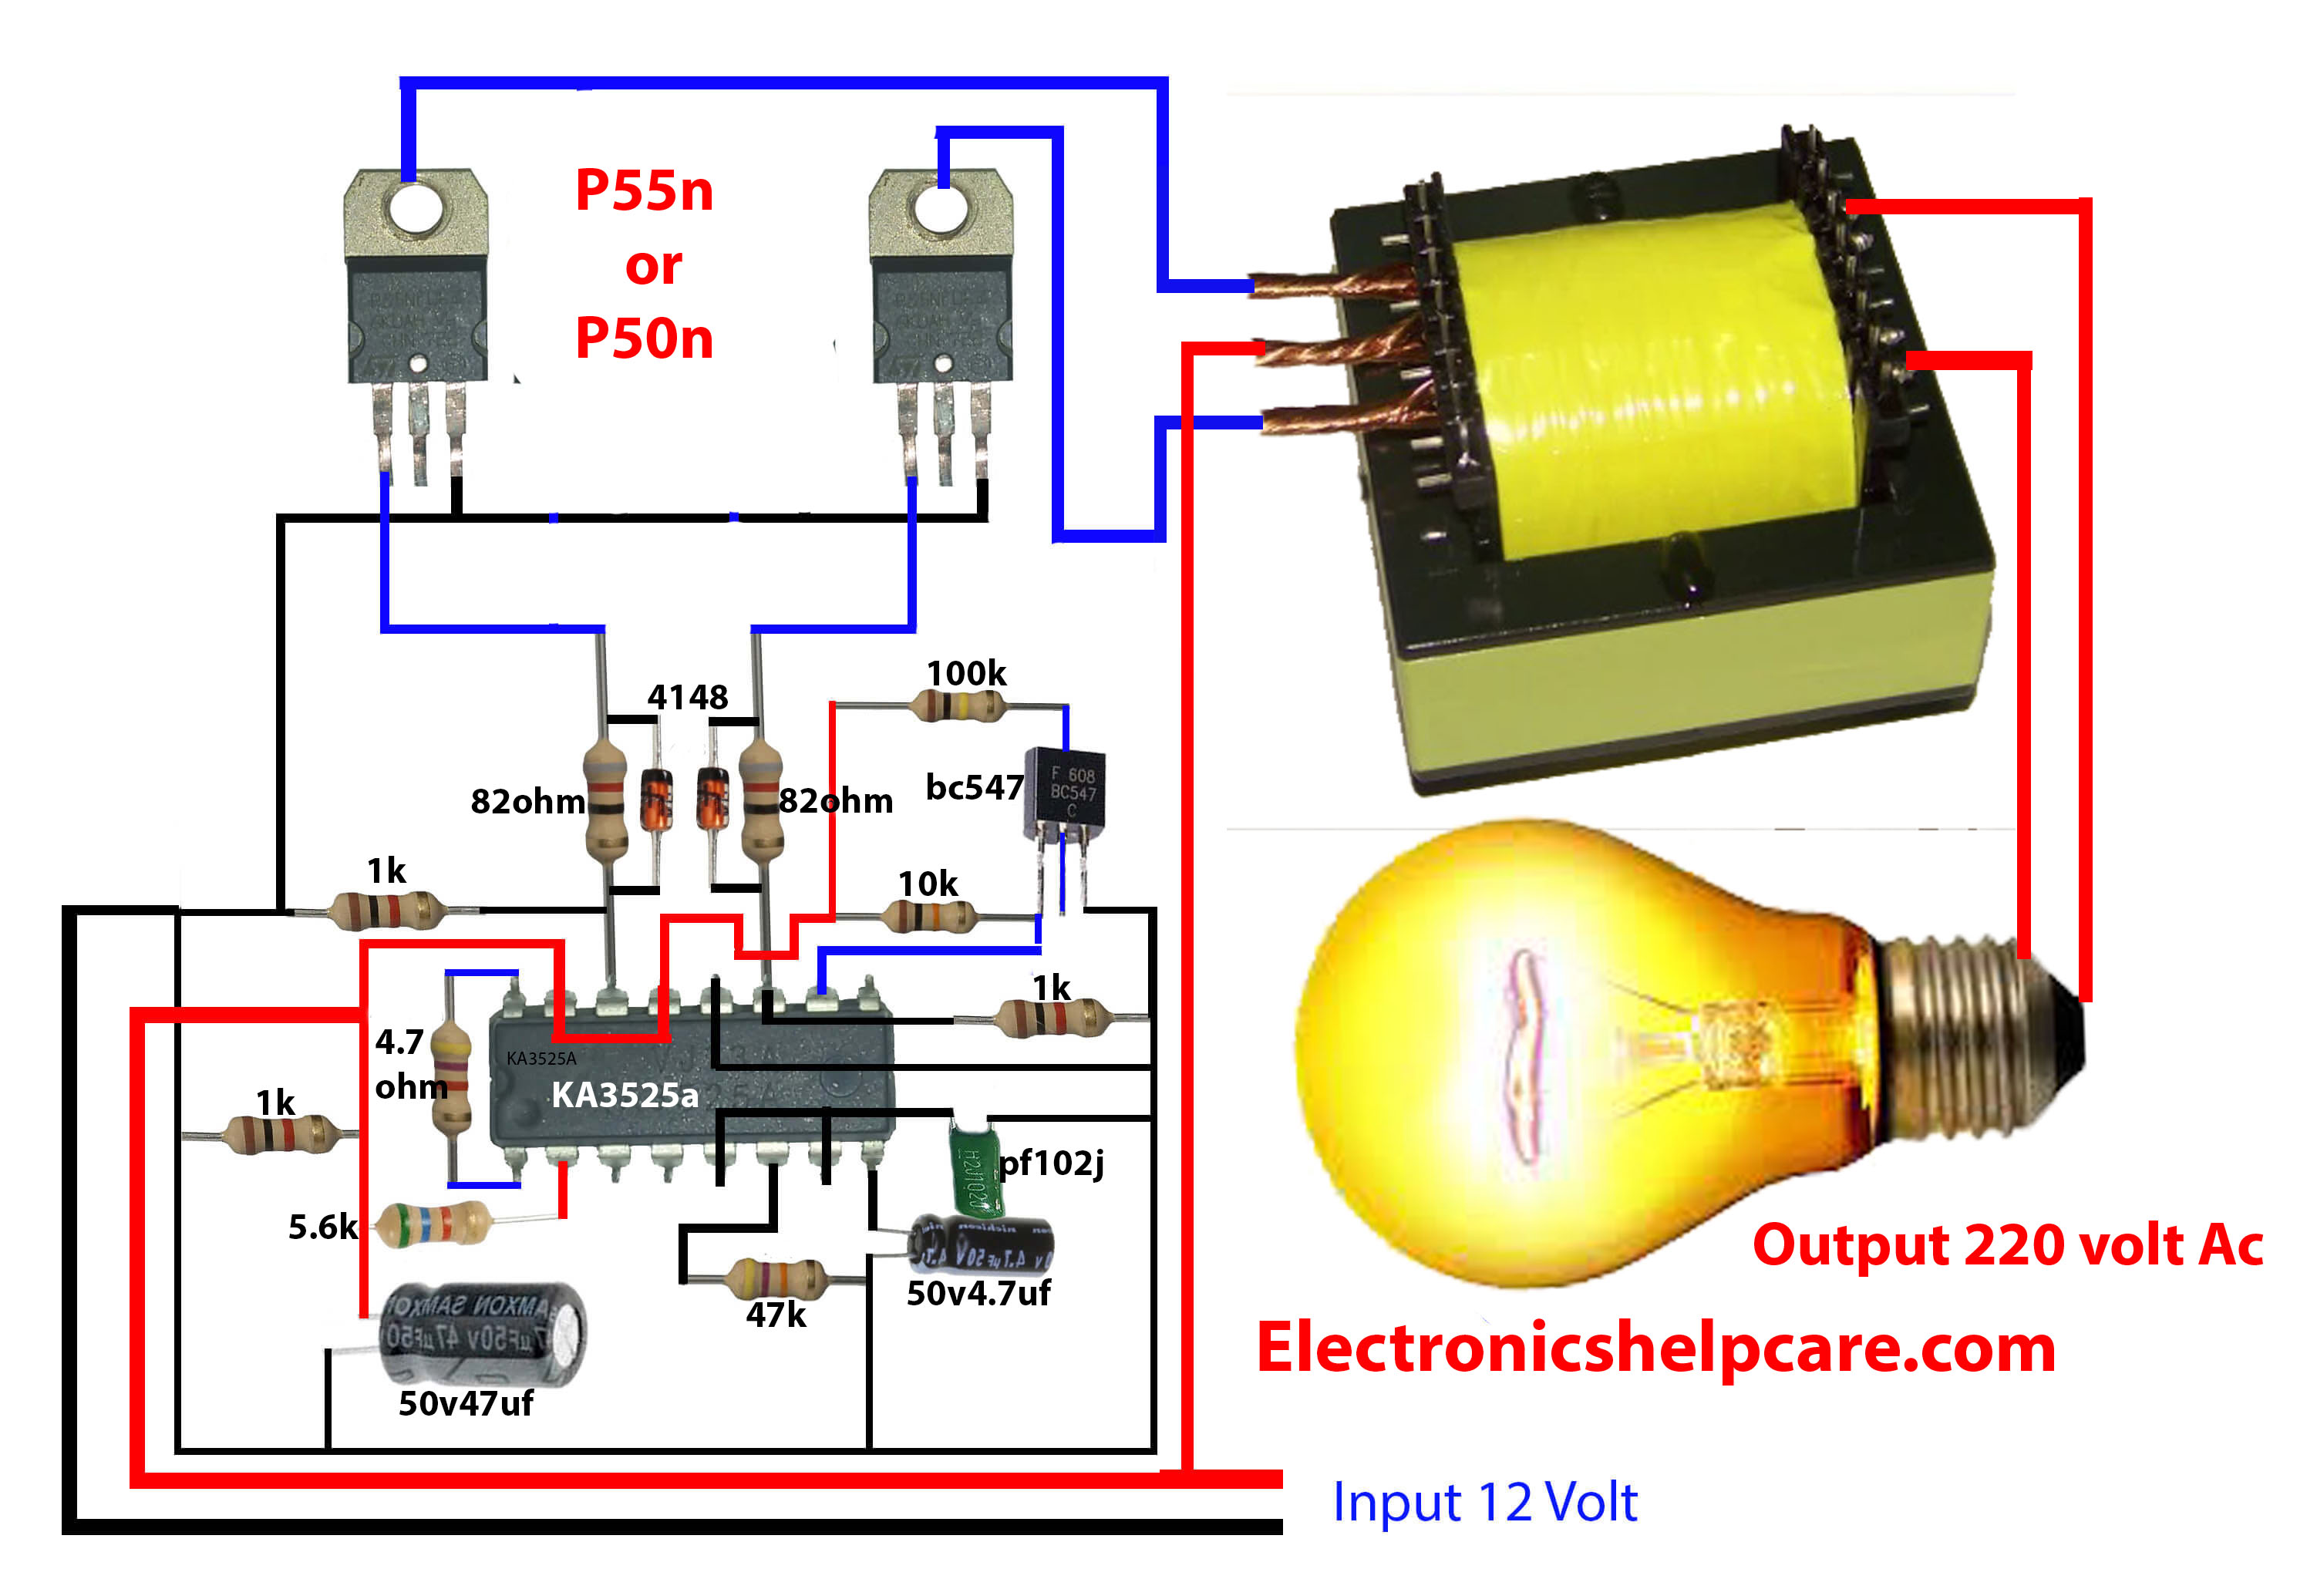 How To Make Inverter 12v Dc To 220v Ac Making Circuit Diagram Making Transformer Electronics Electronics Help Care